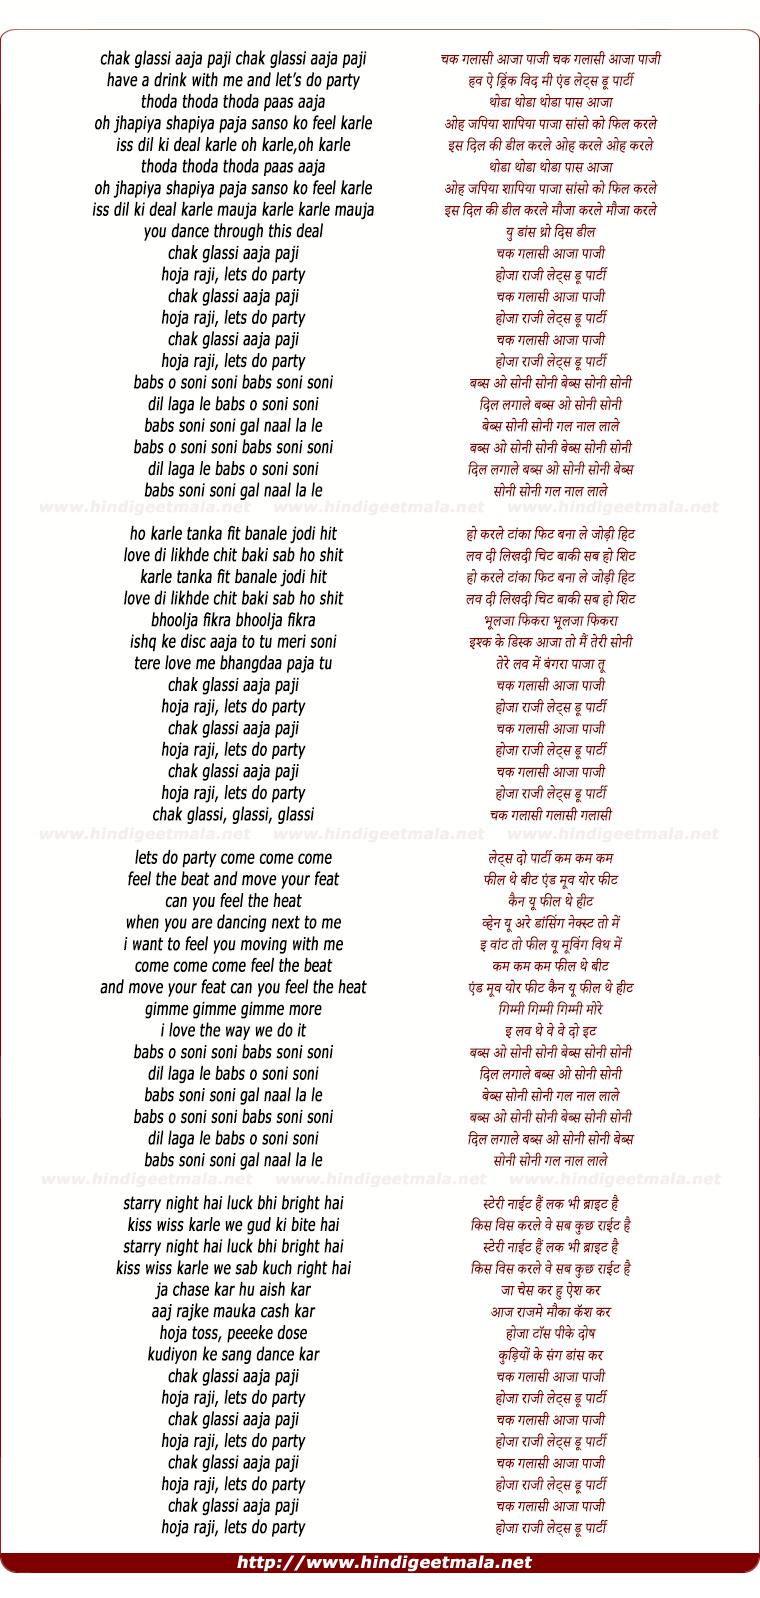 lyrics of song Chak Glassi (Remix)